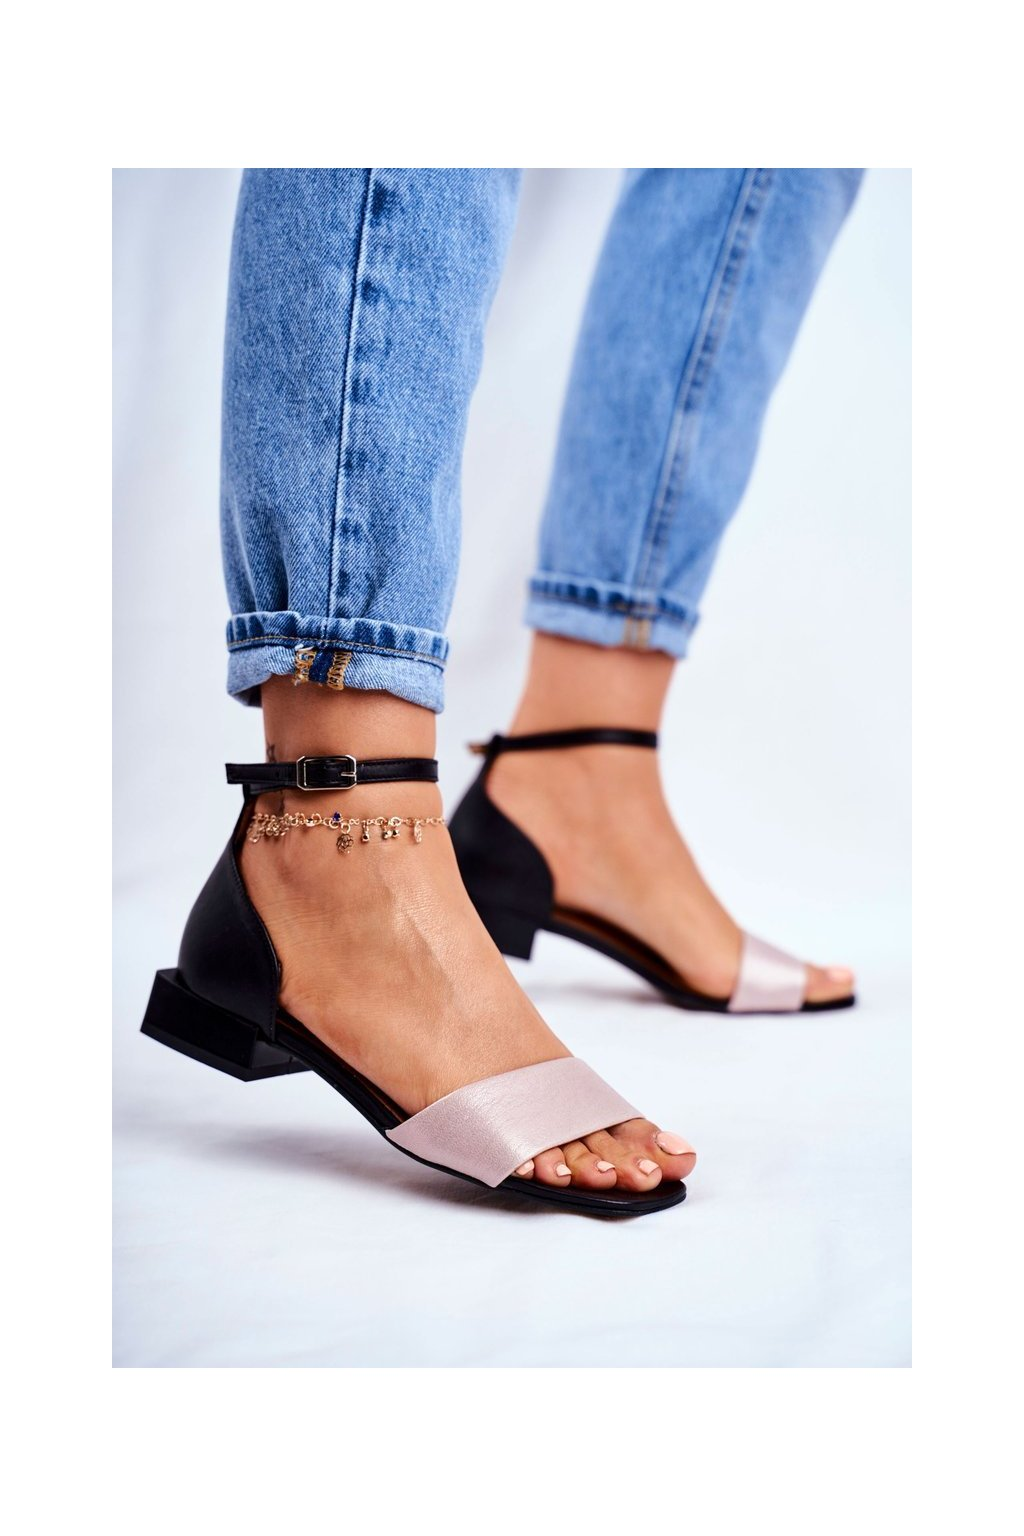 Dámske sandále s plochou podrážkou farba čierna kód obuvi 04618-21/00-5 CZARNY+RÓŻ BŁYSZCZĄCY